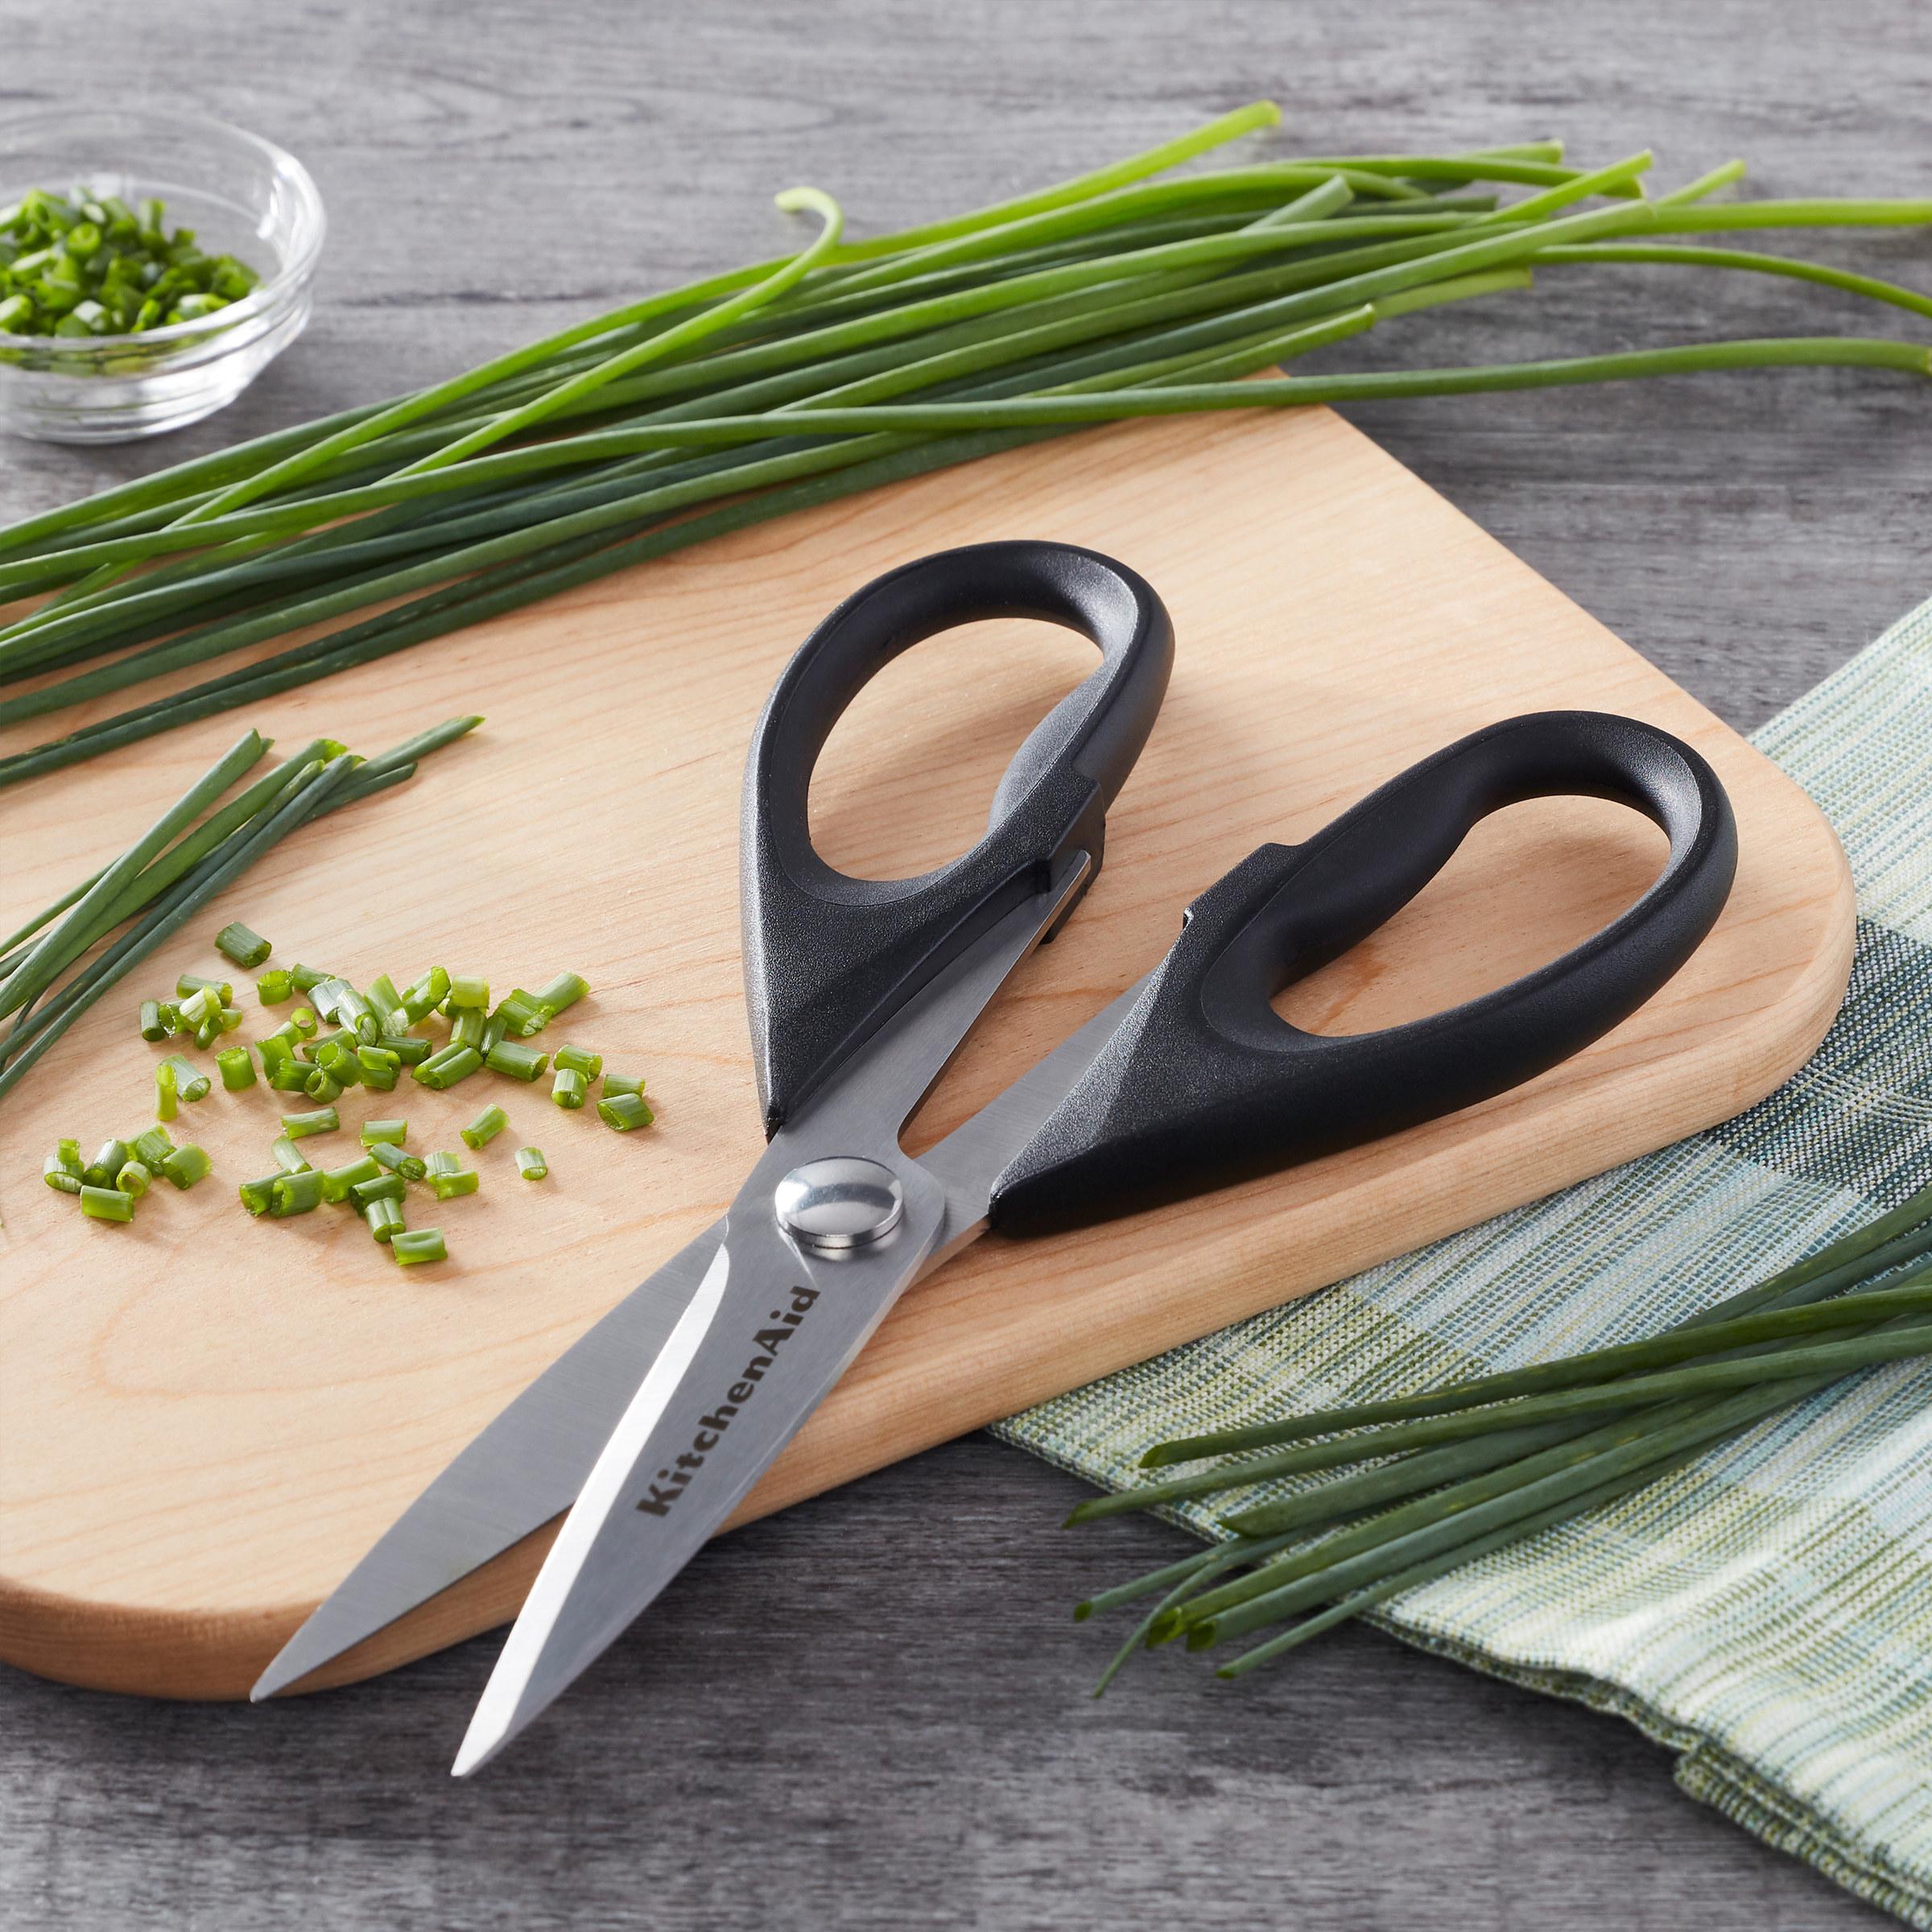 black kitchenaid shears on a wooden cutting board